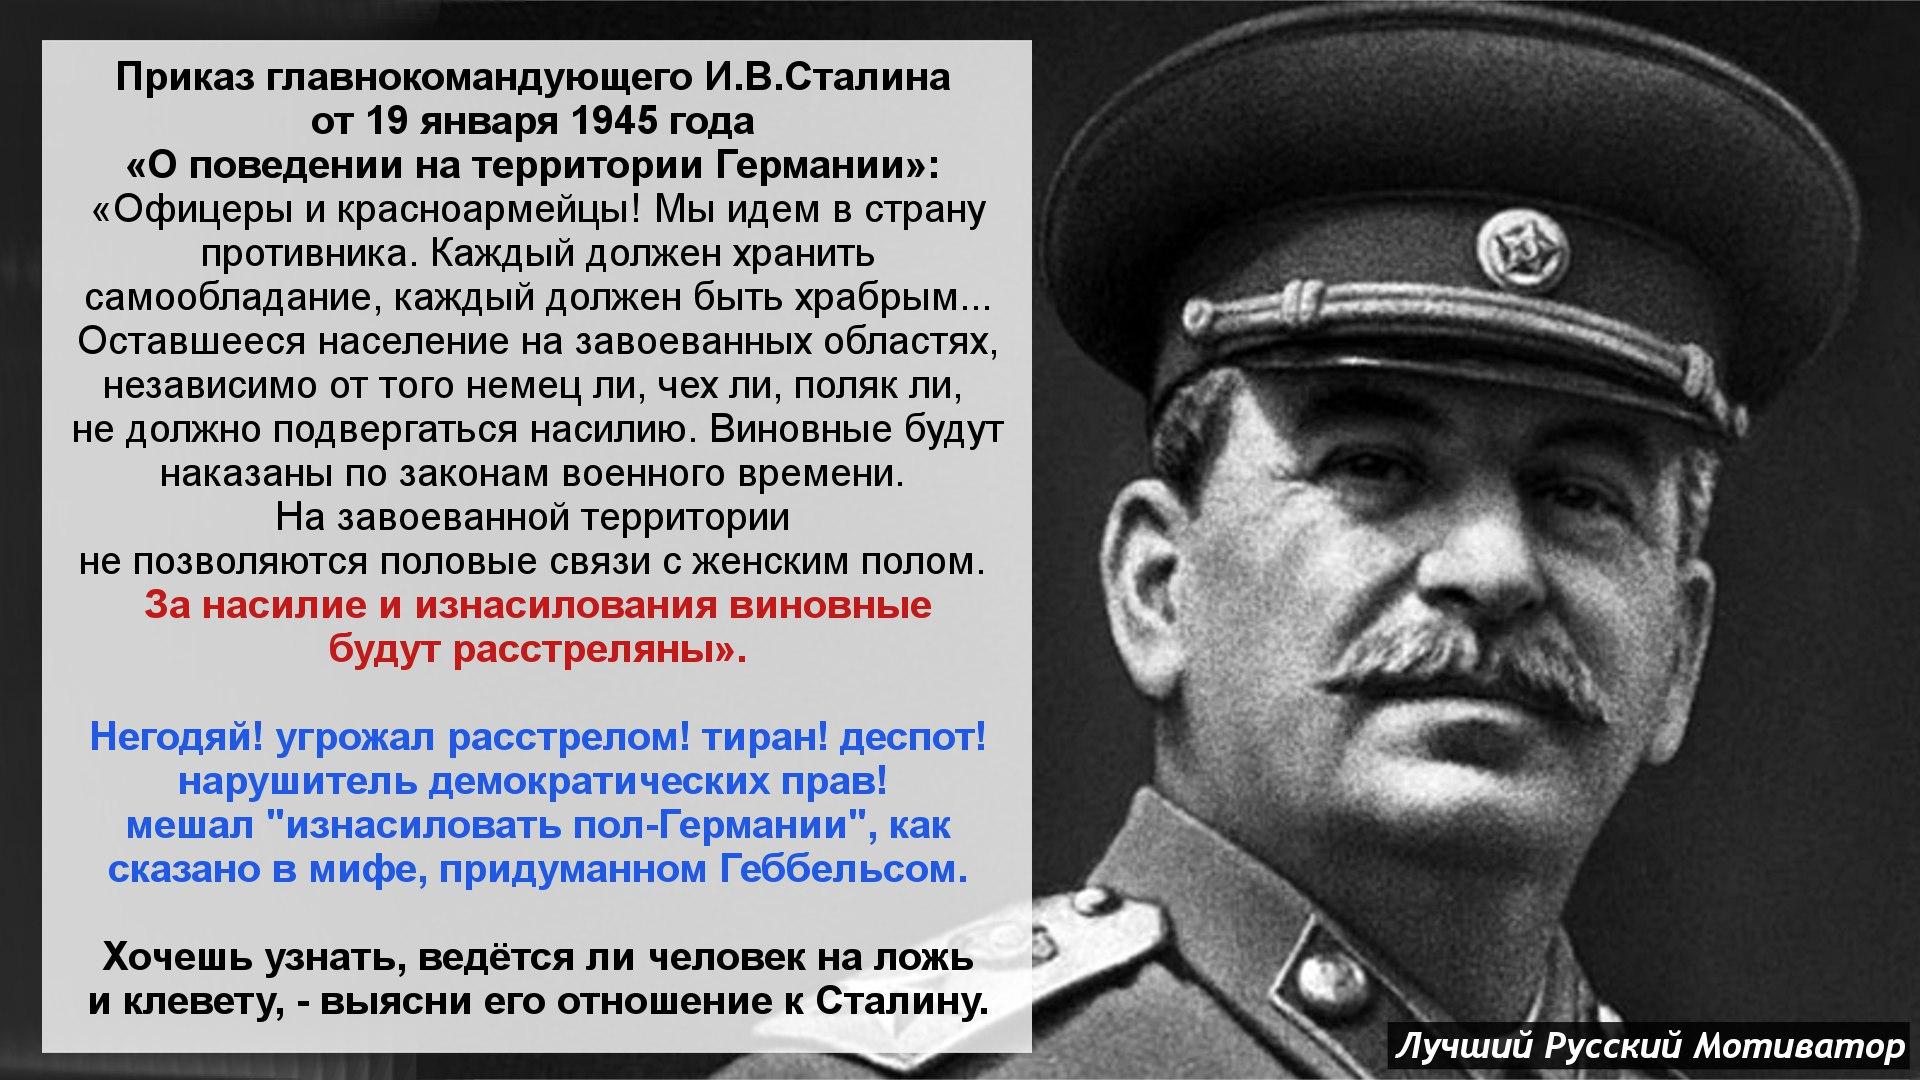 Дневник сталина